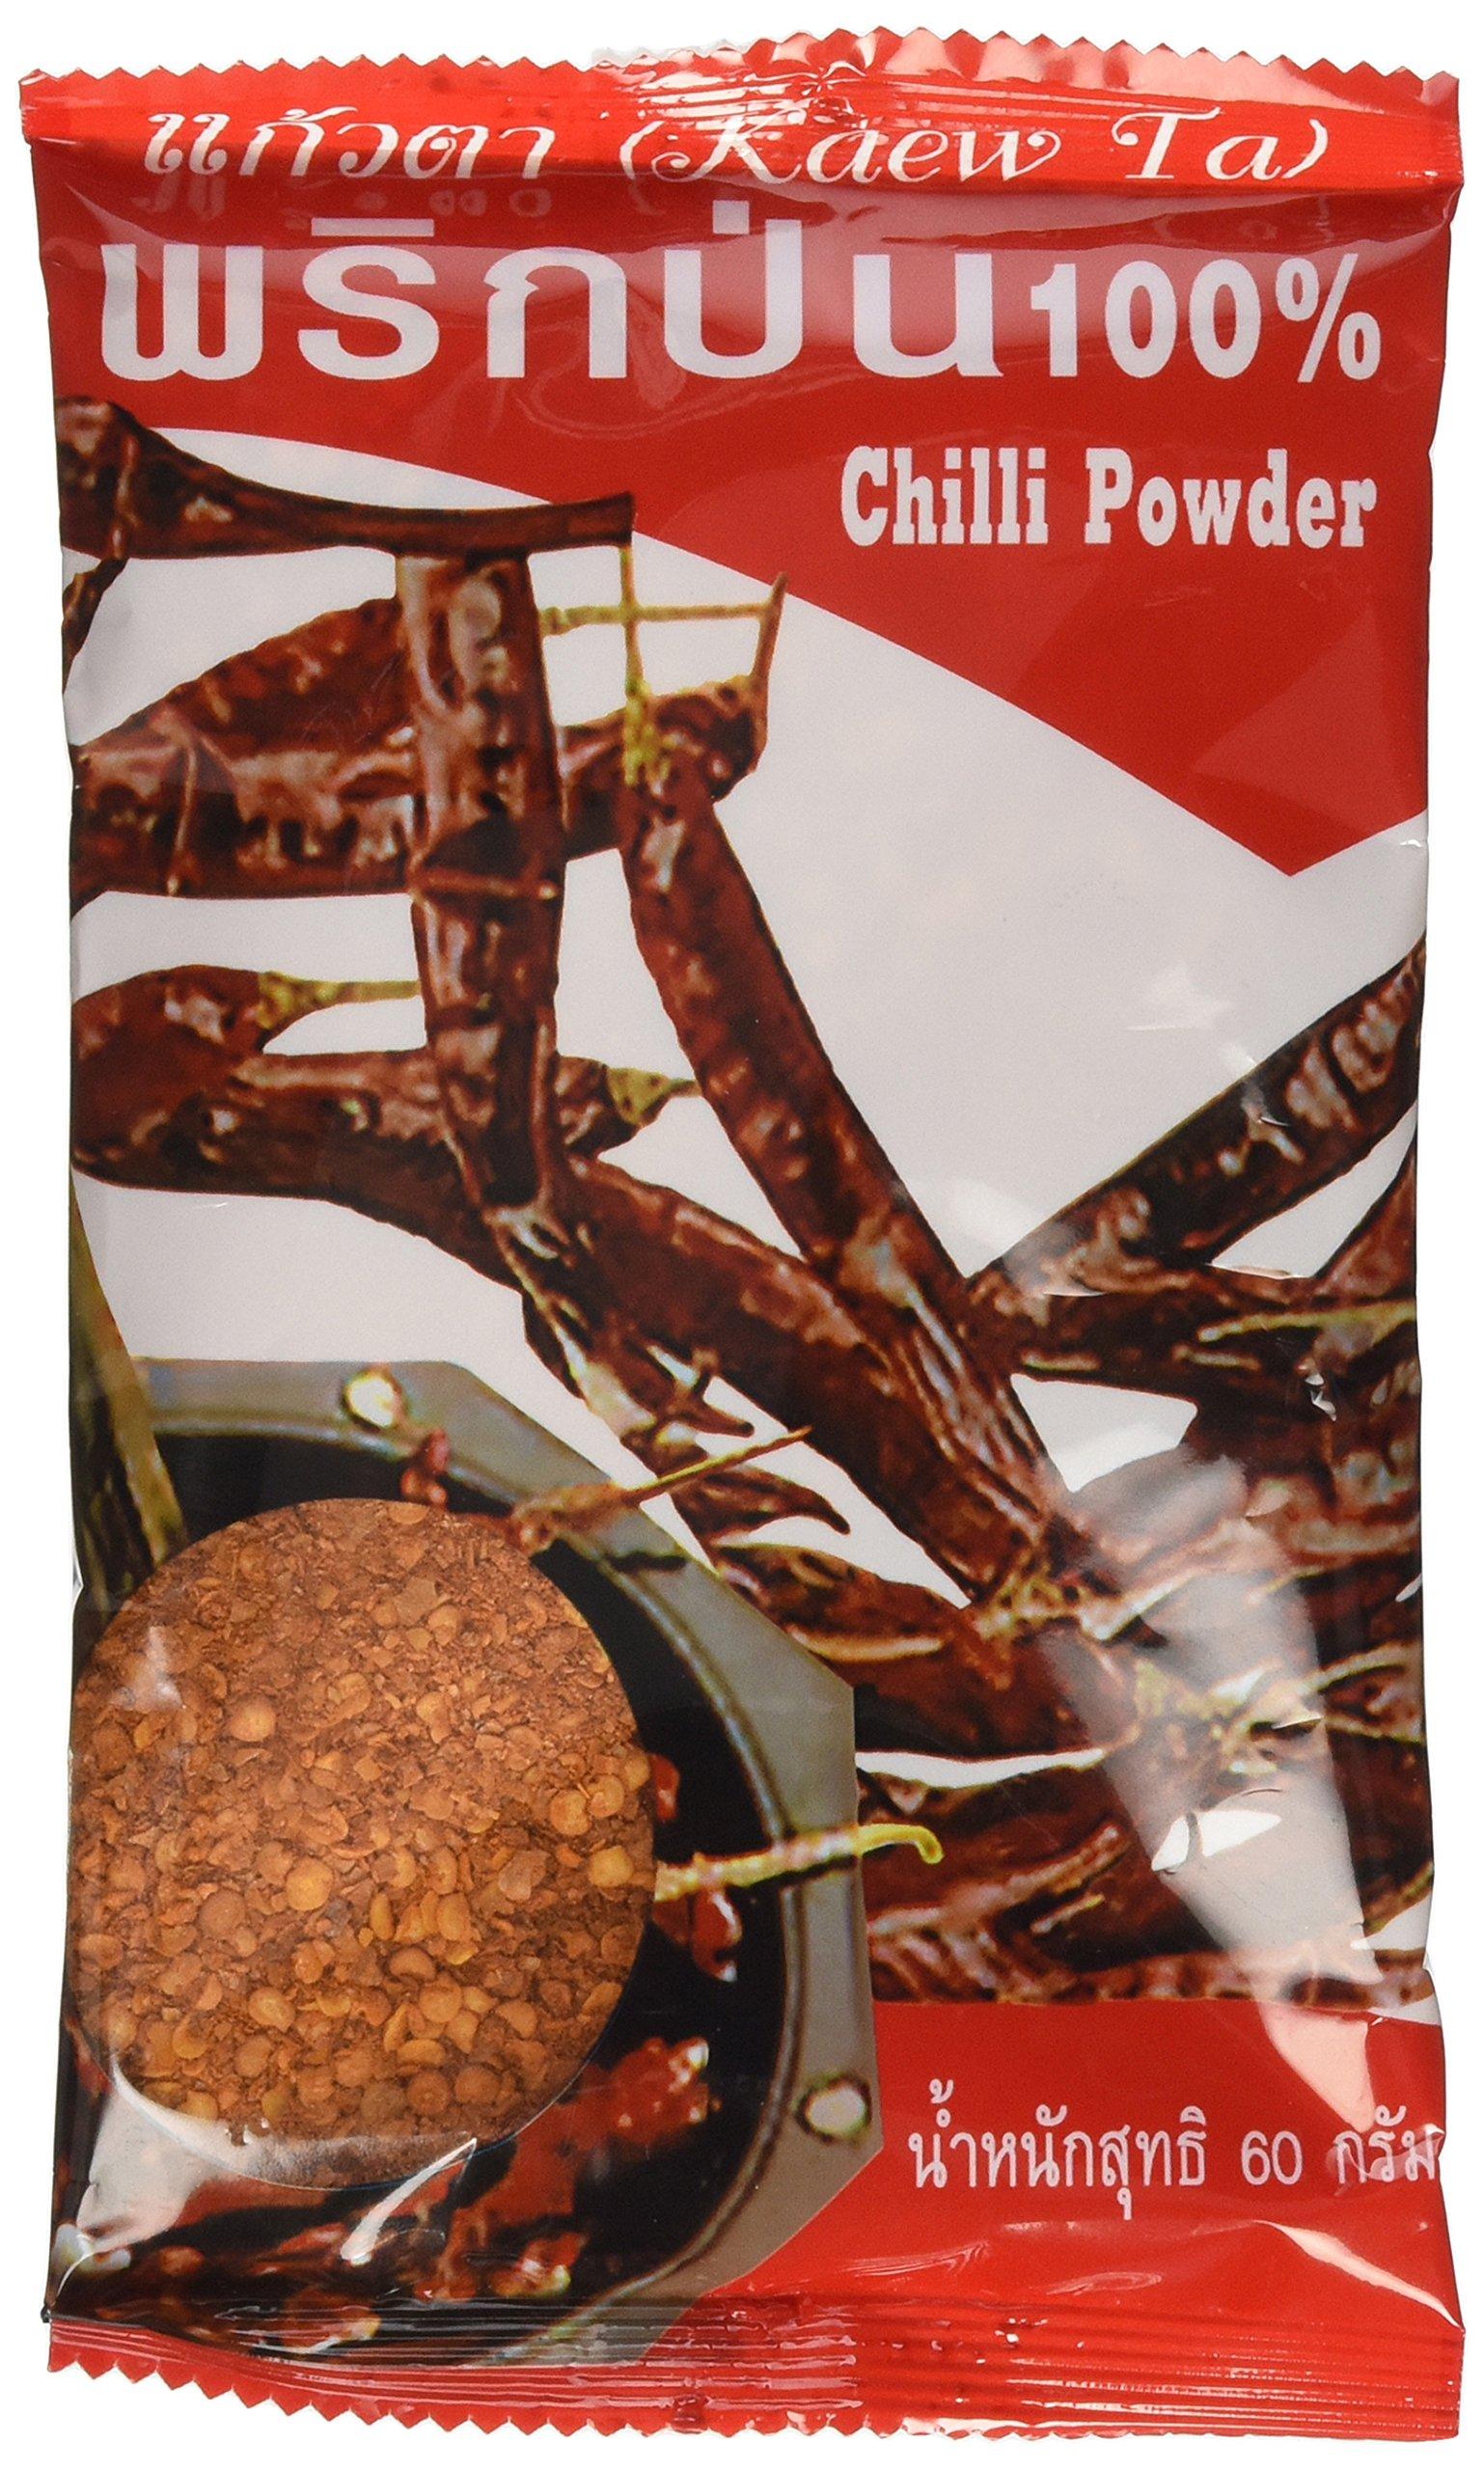 Dried Chilli Powder (Prik Pon) 100% Natural Very Spicy Thai Style Net Wt 60 G (2.11 Oz) Kaew-ta Brand X 4 Bags